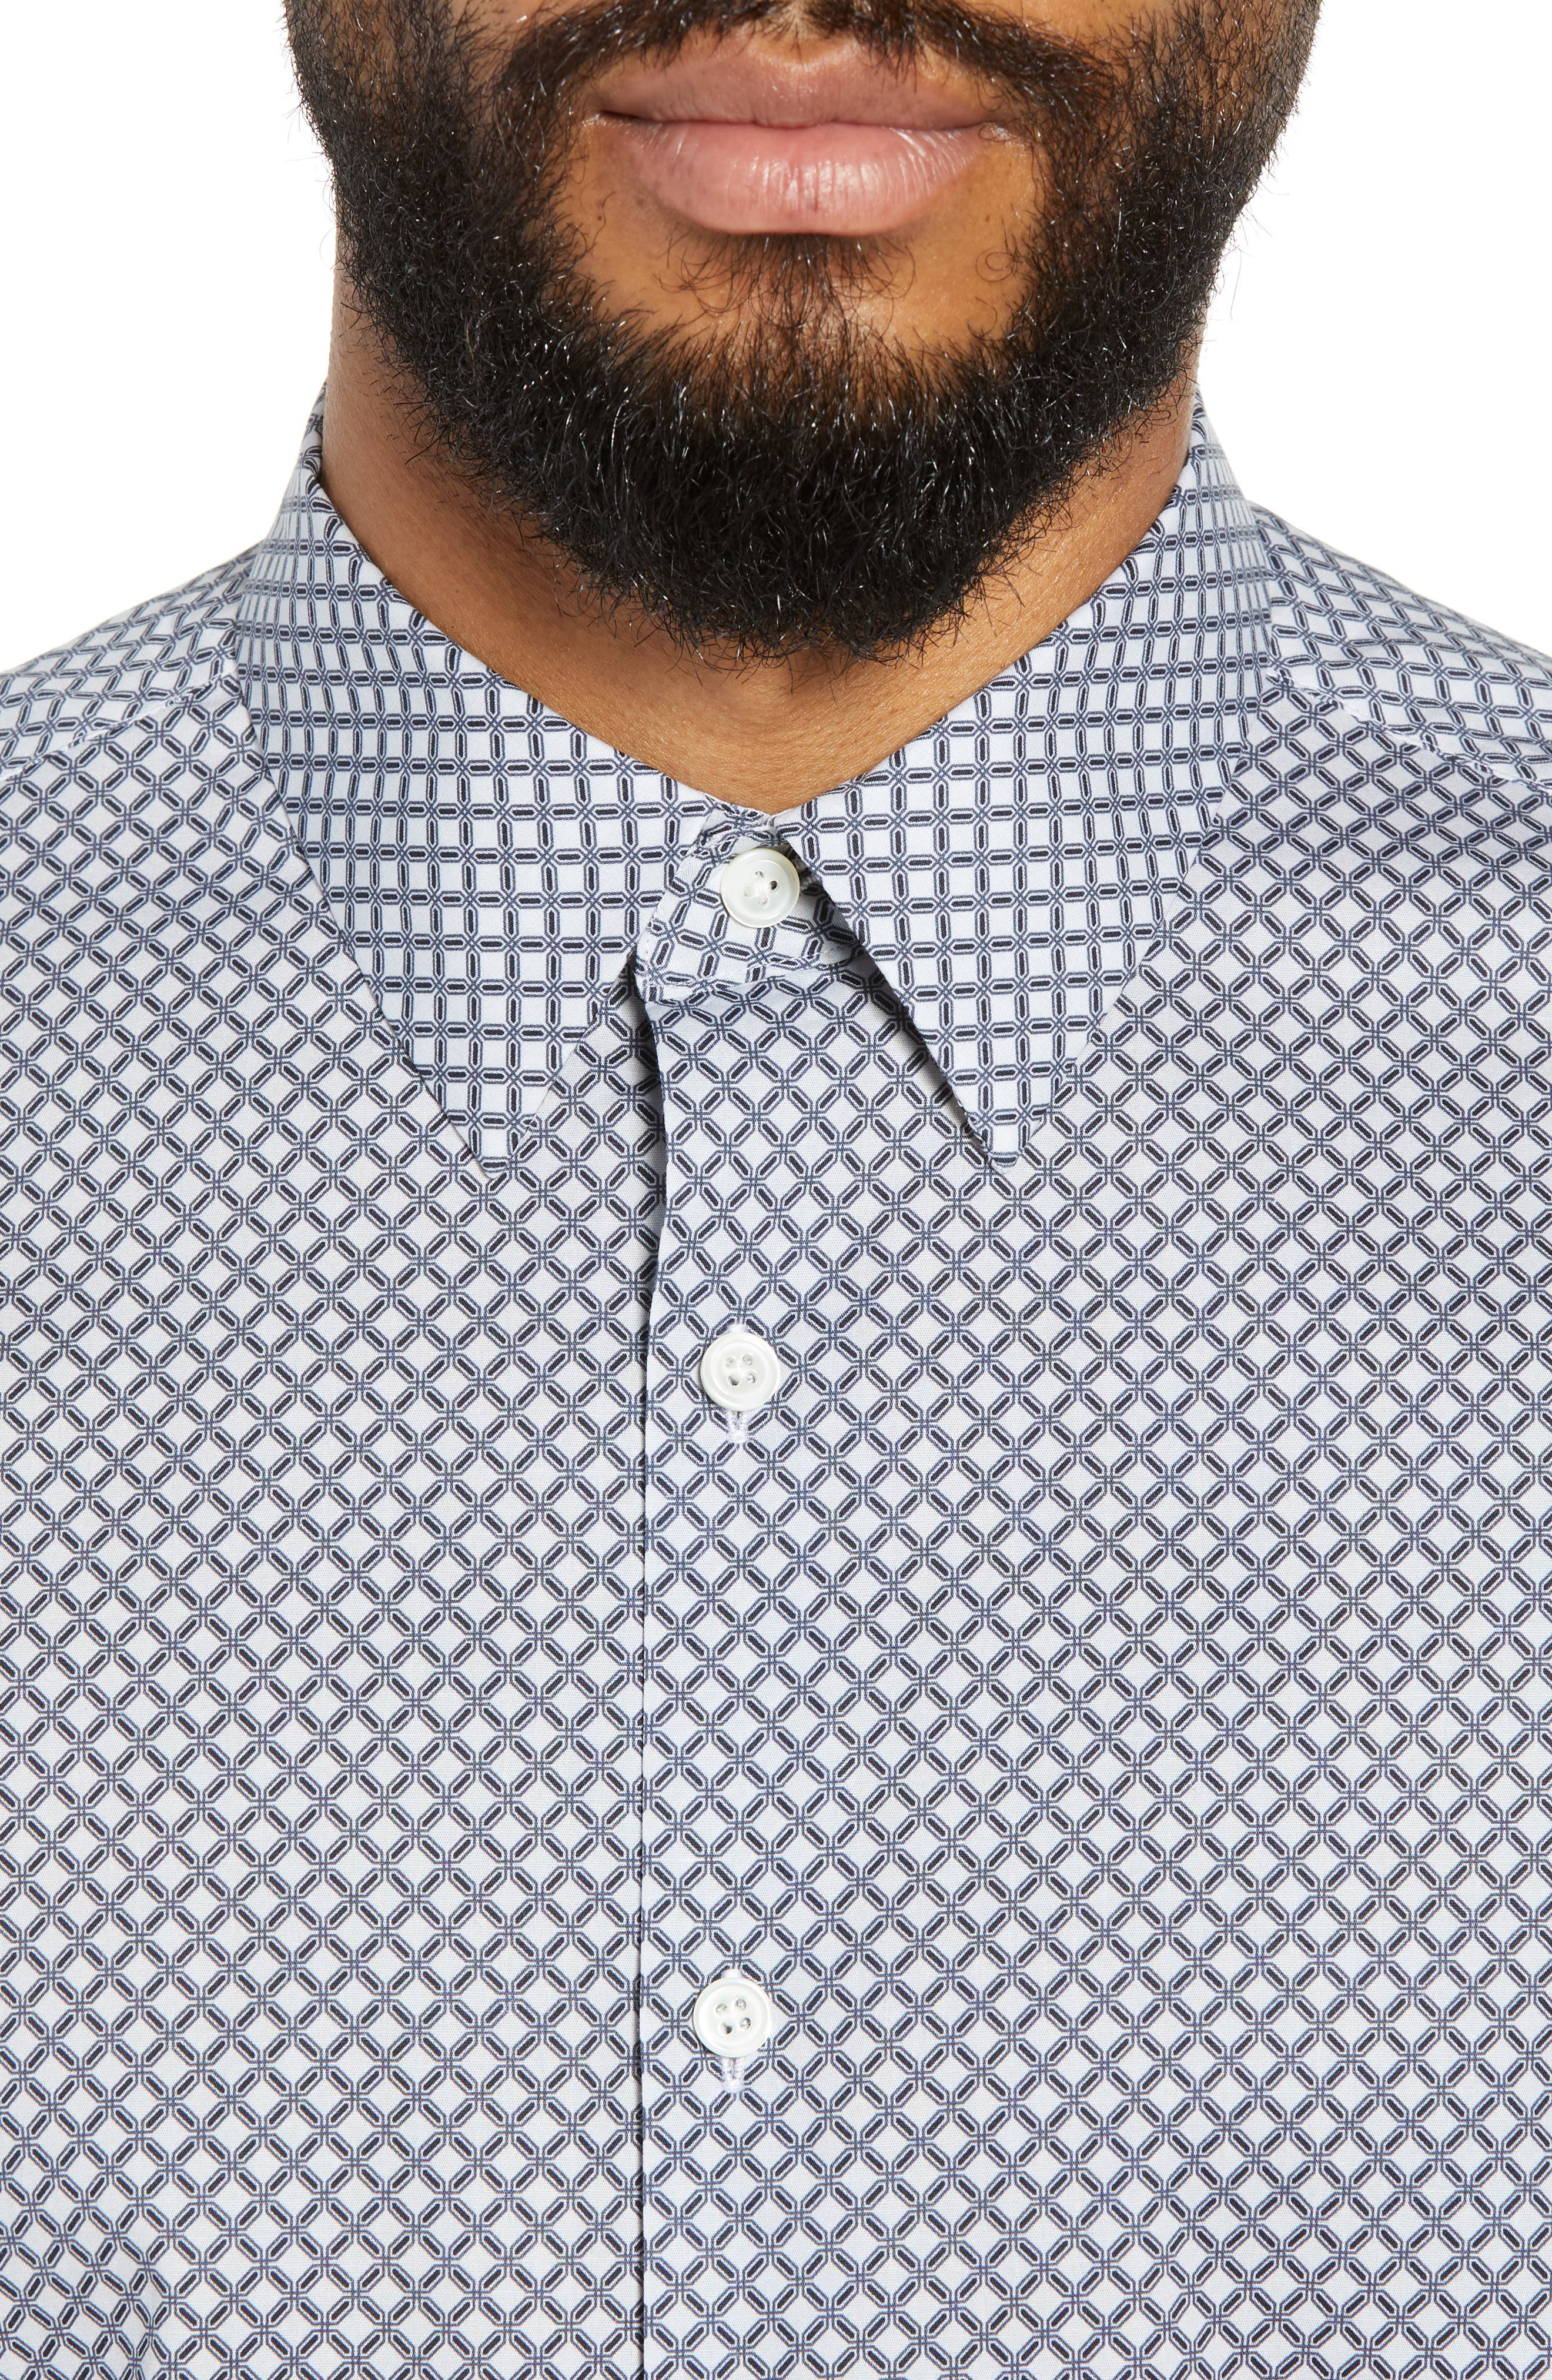 Menlo Halldale Slim Fit Stretch Short Sleeve Sport Shirt,                             Alternate thumbnail 2, color,                             Shale Multi